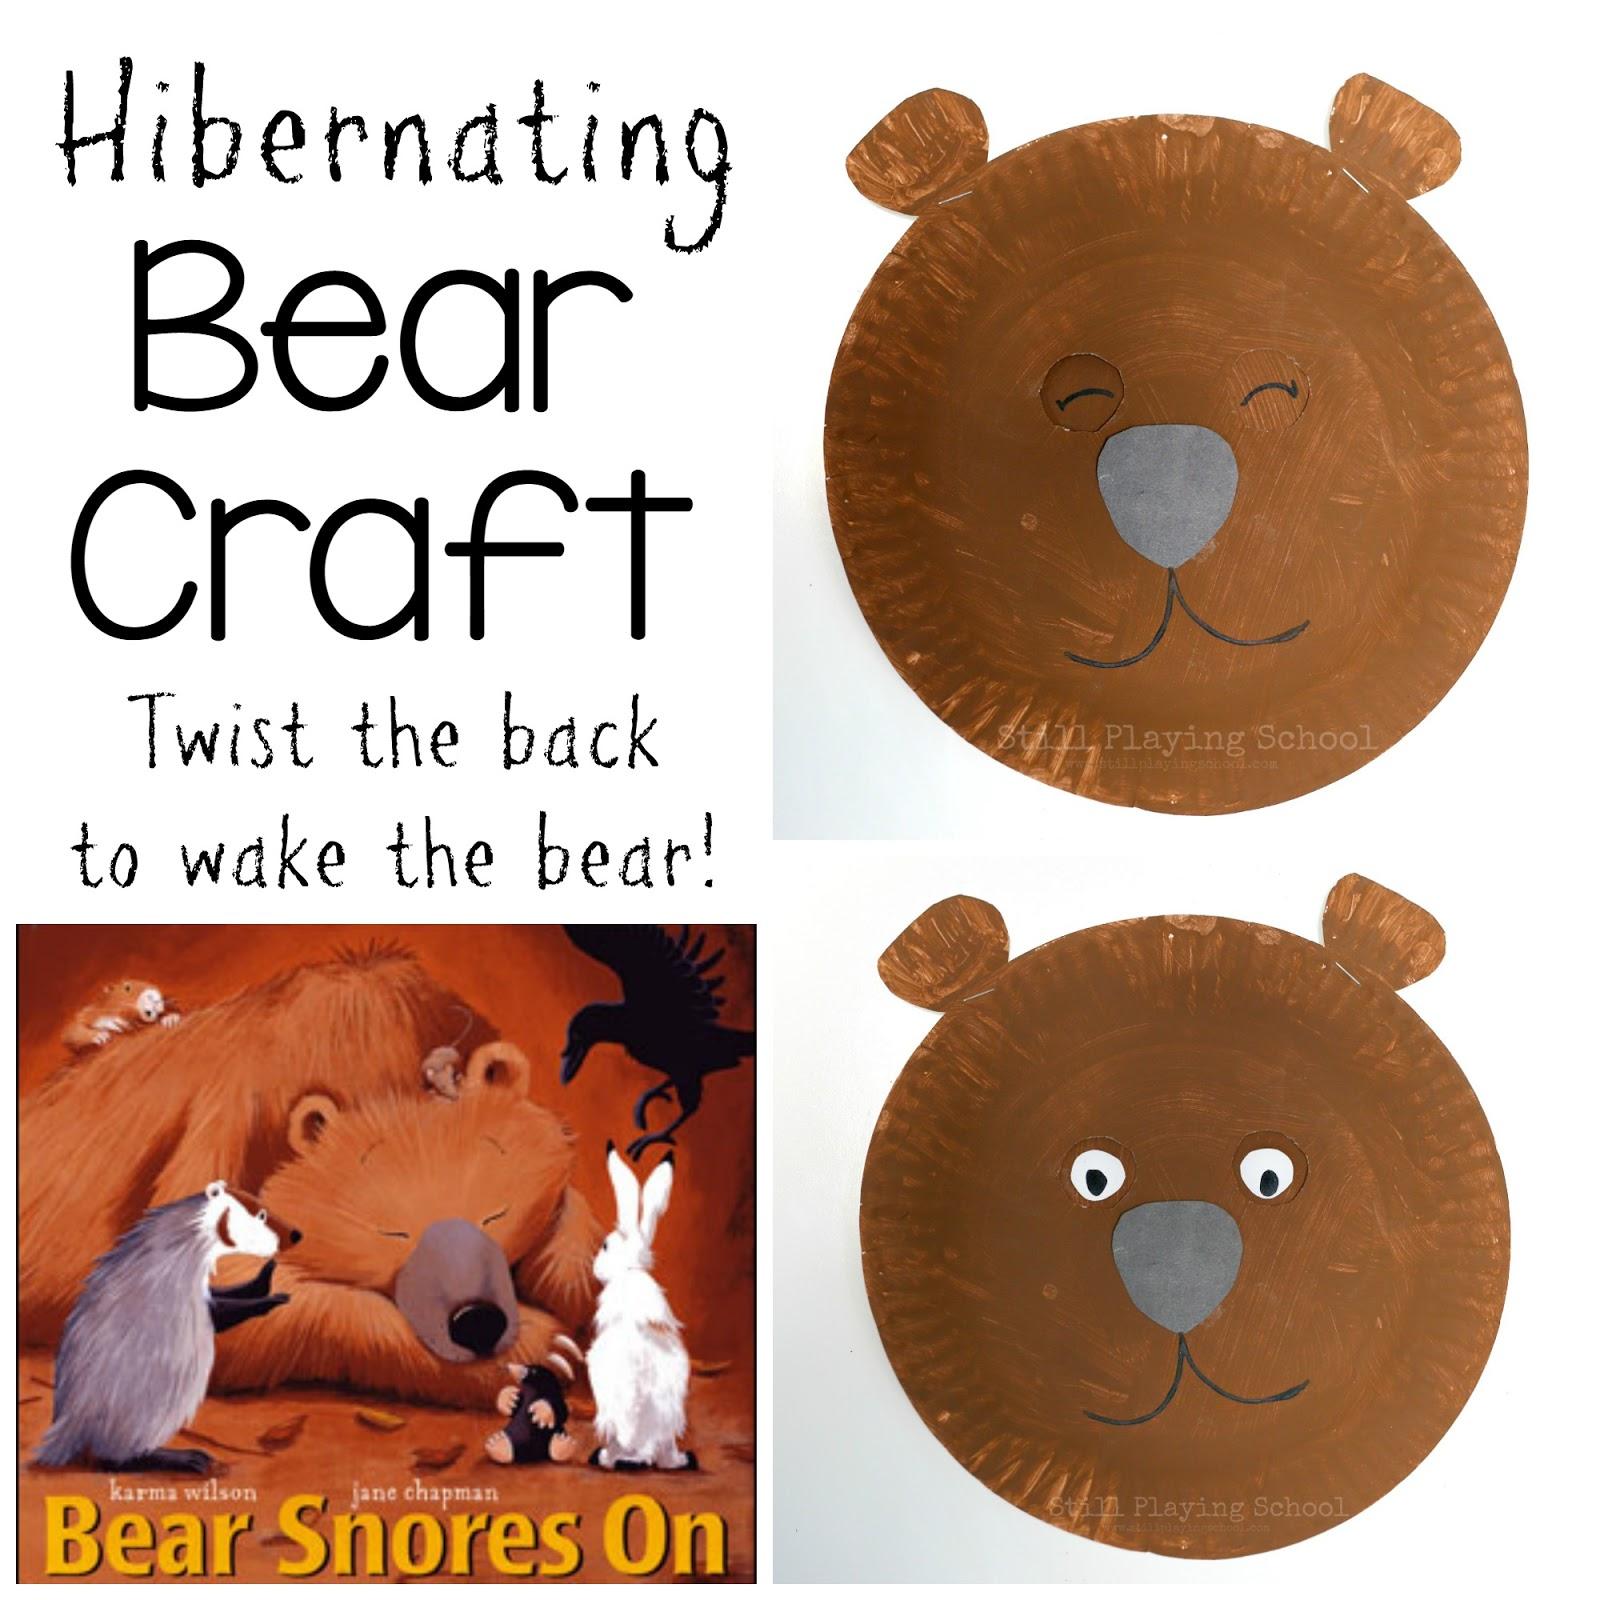 Hibernating Bear Craft For Kids